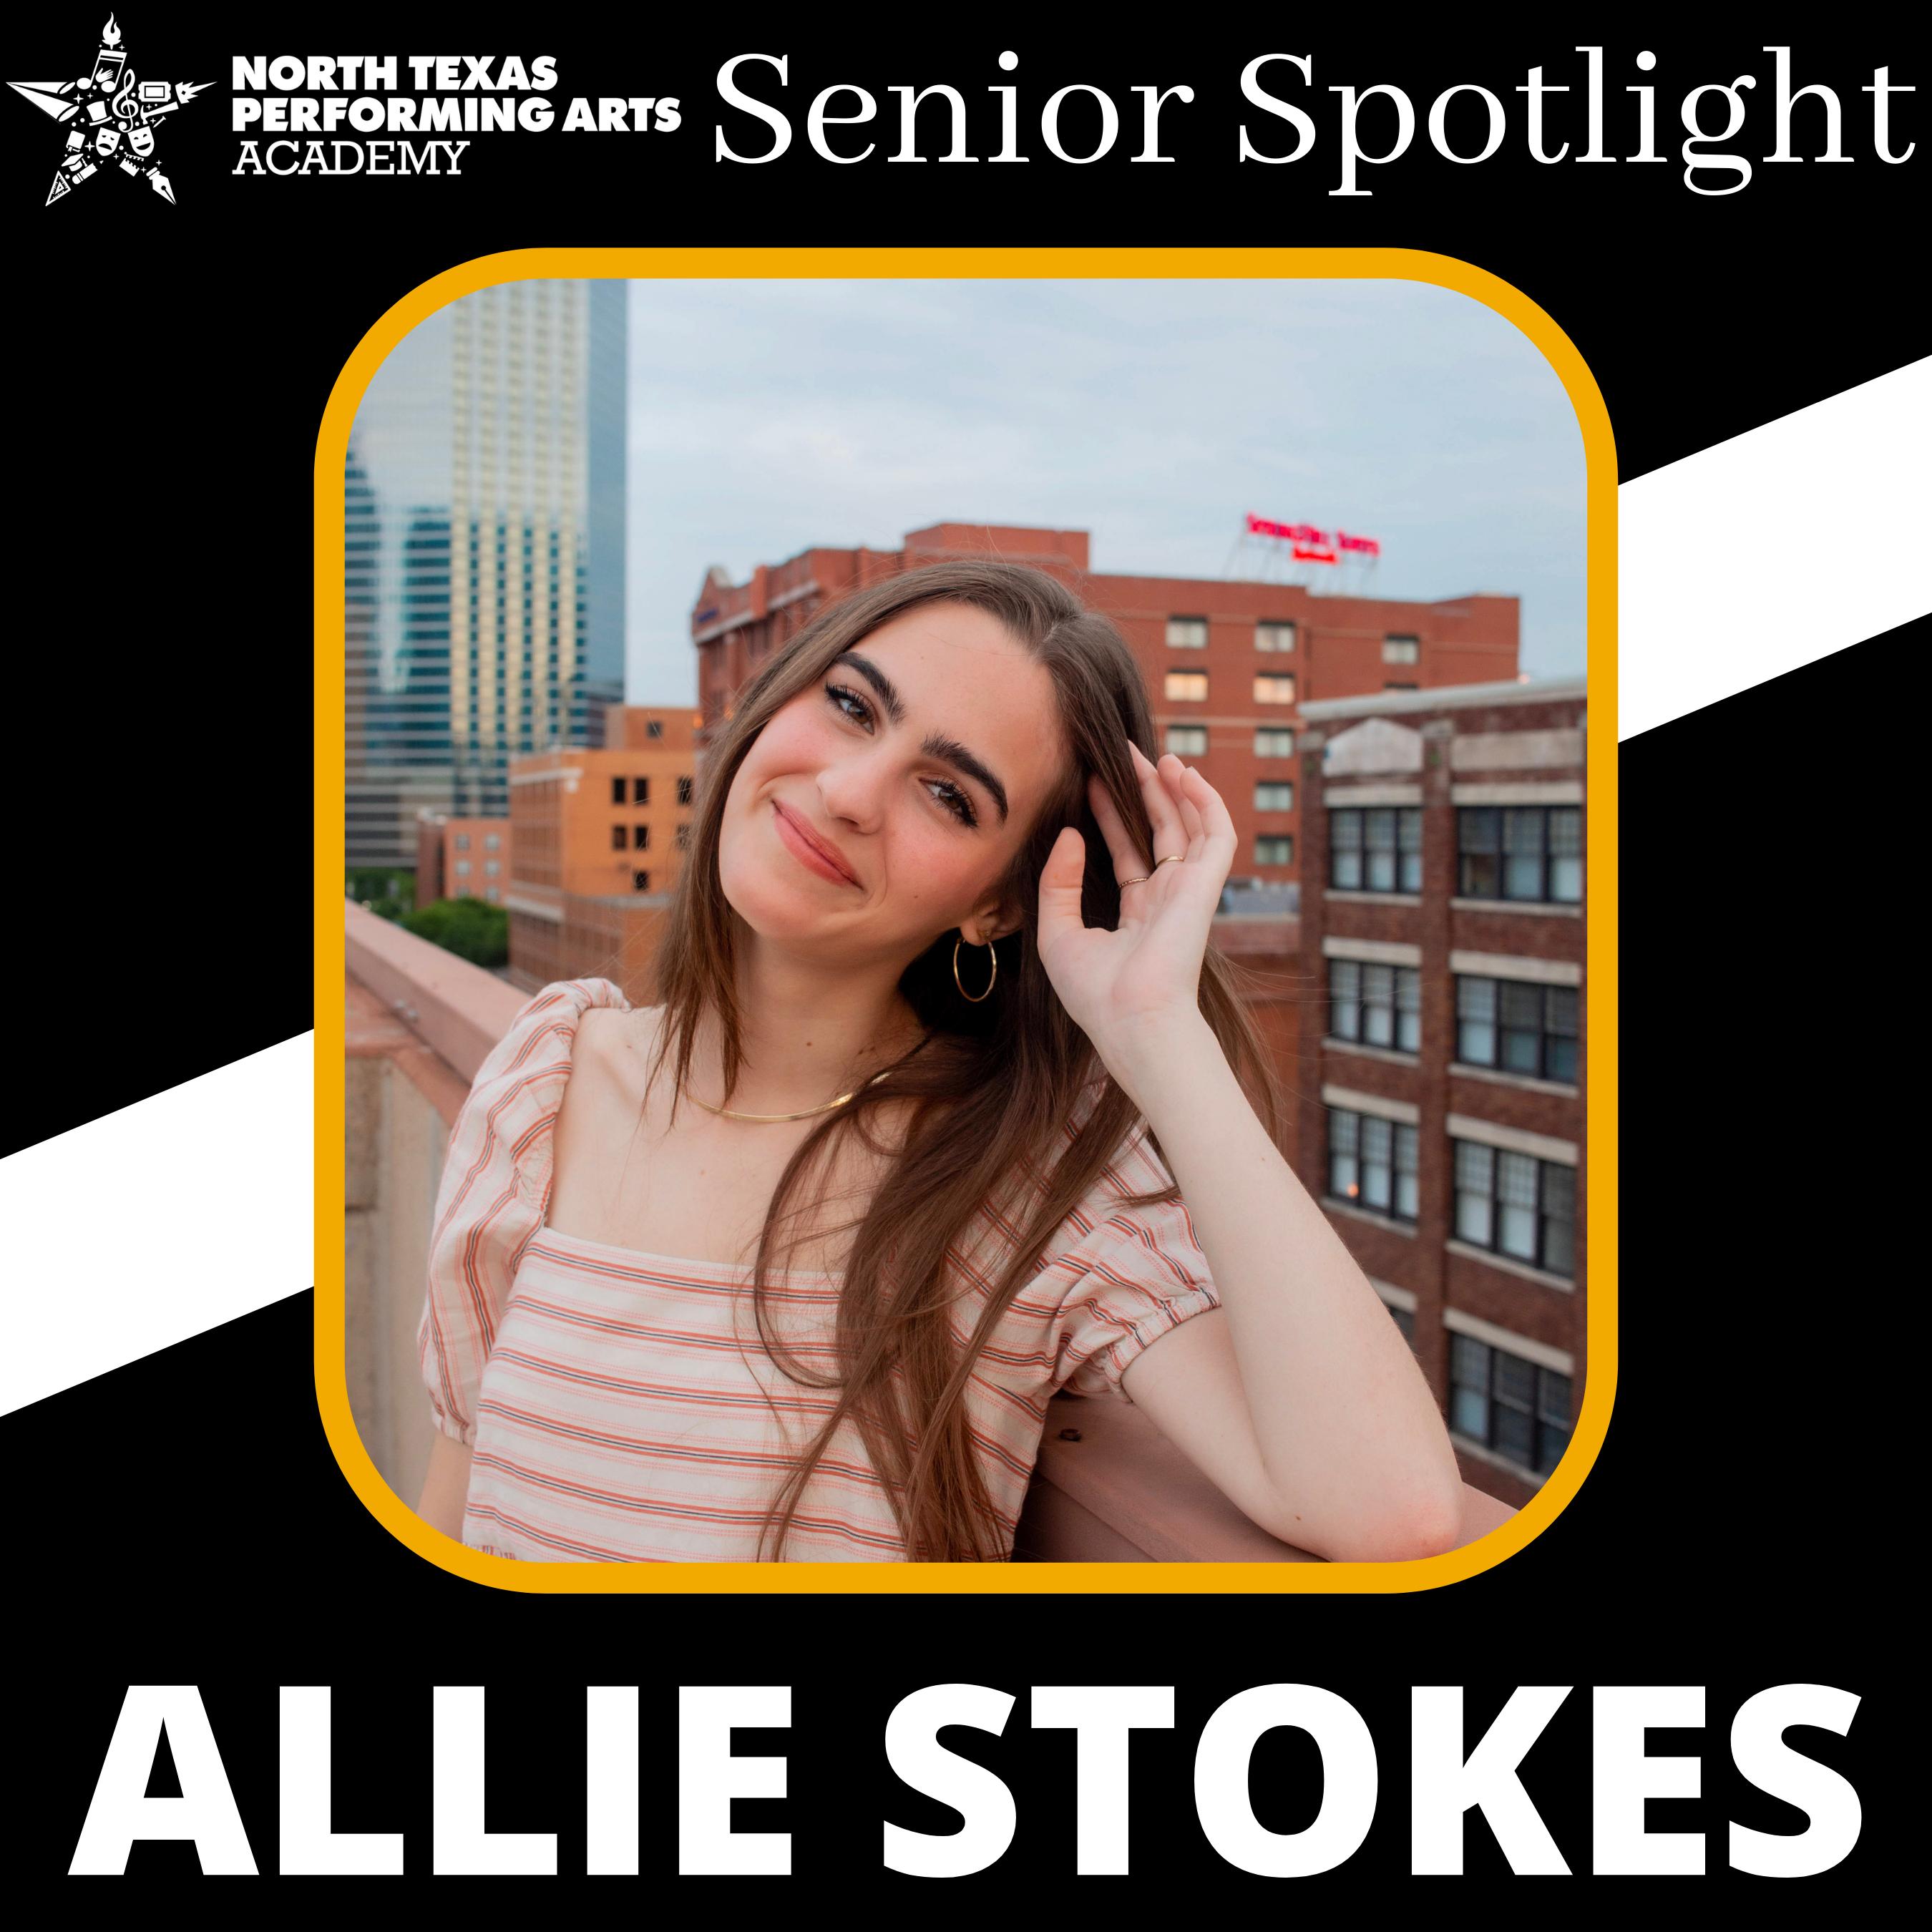 Allie Stokes headshot